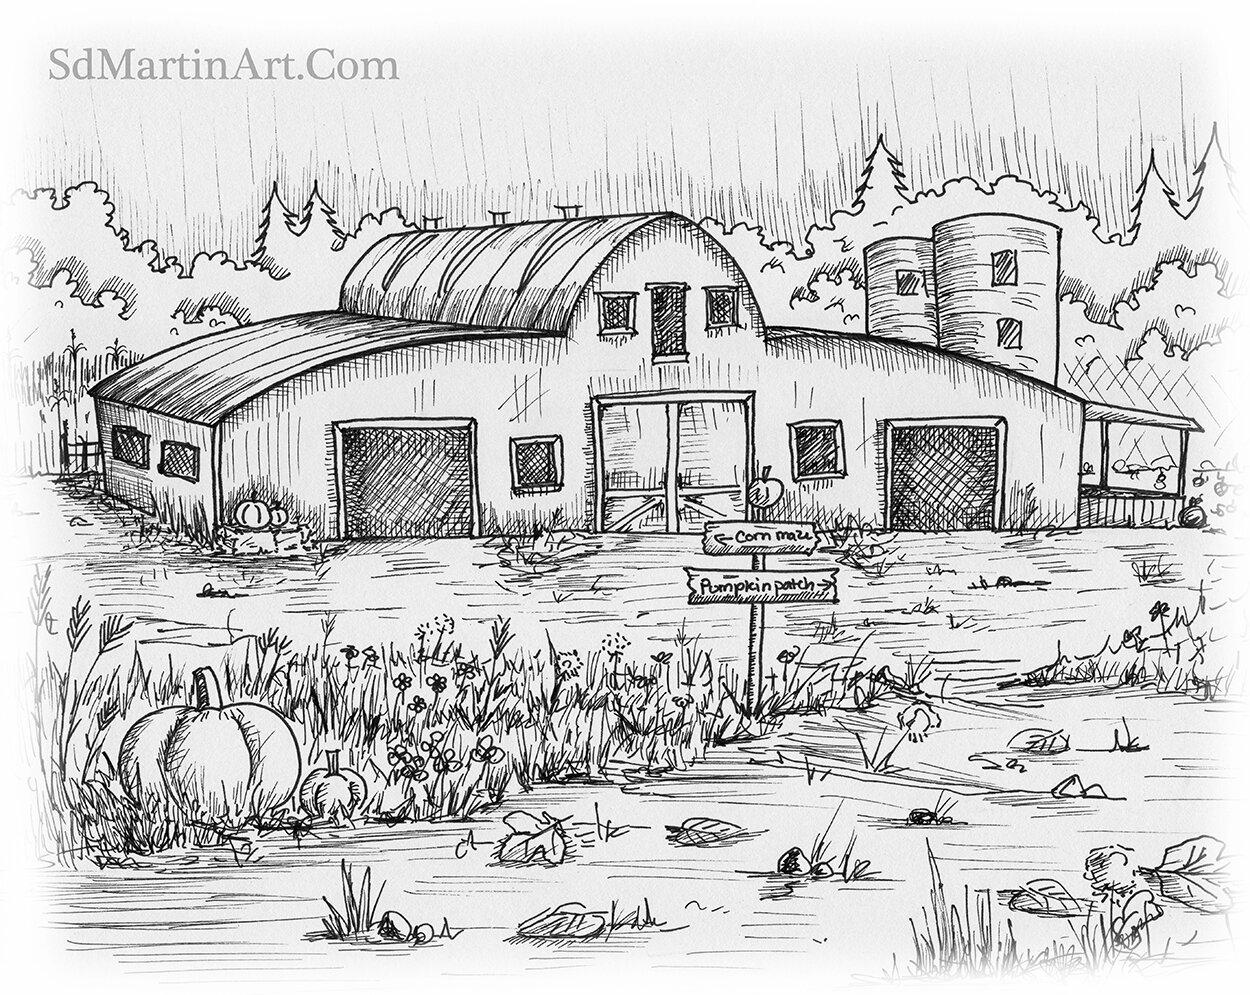 Inktober Day 15: Bob's Barn